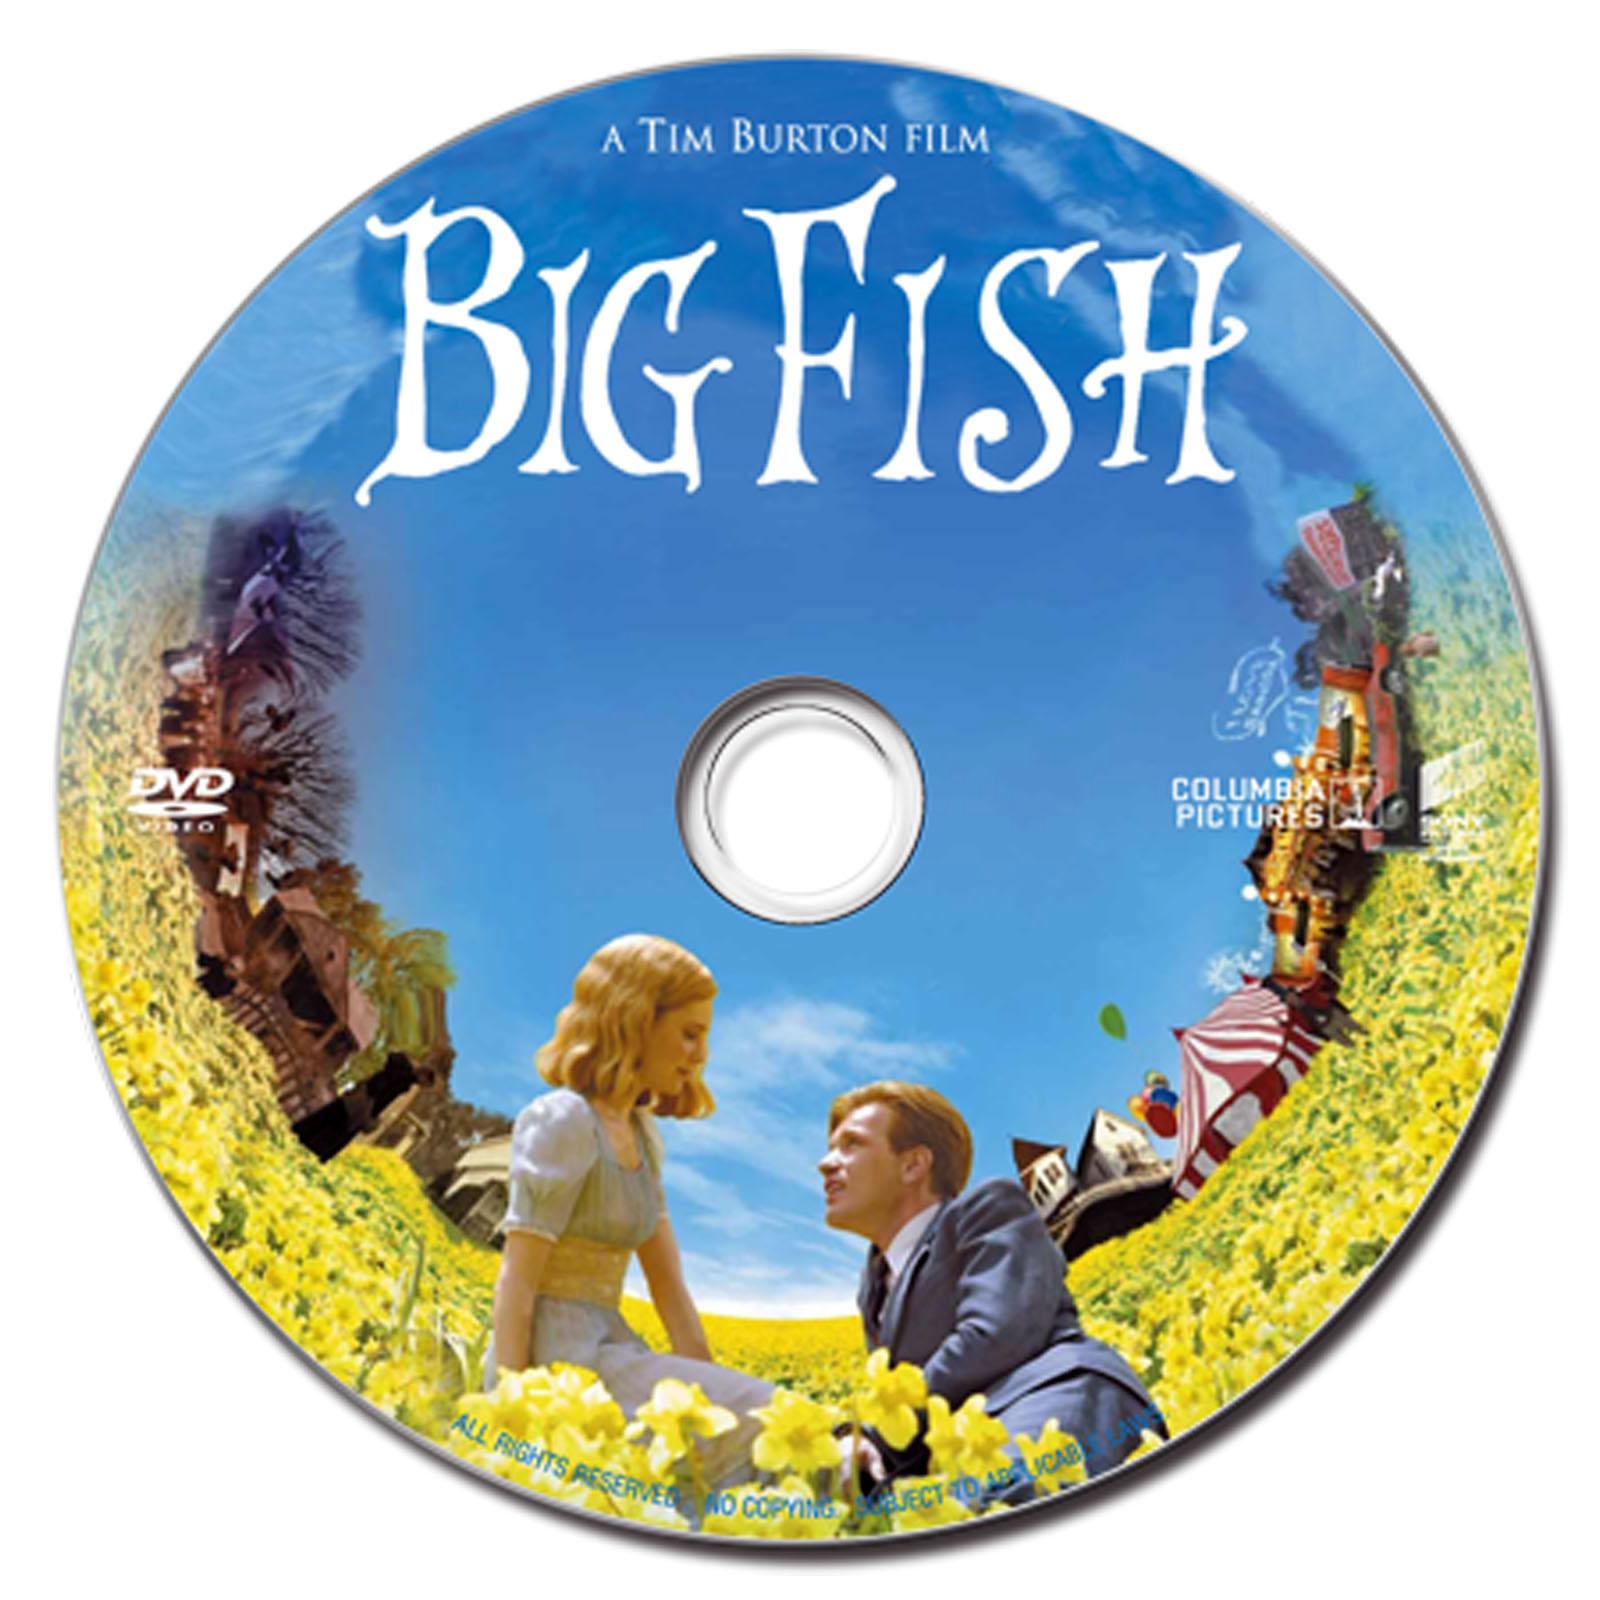 Sasha Lane American Honey Star likewise Oscar moreover Big Fish 2003 together with Oscar Nemo moreover Picture Of Dorian Gray. on oscar fish movie